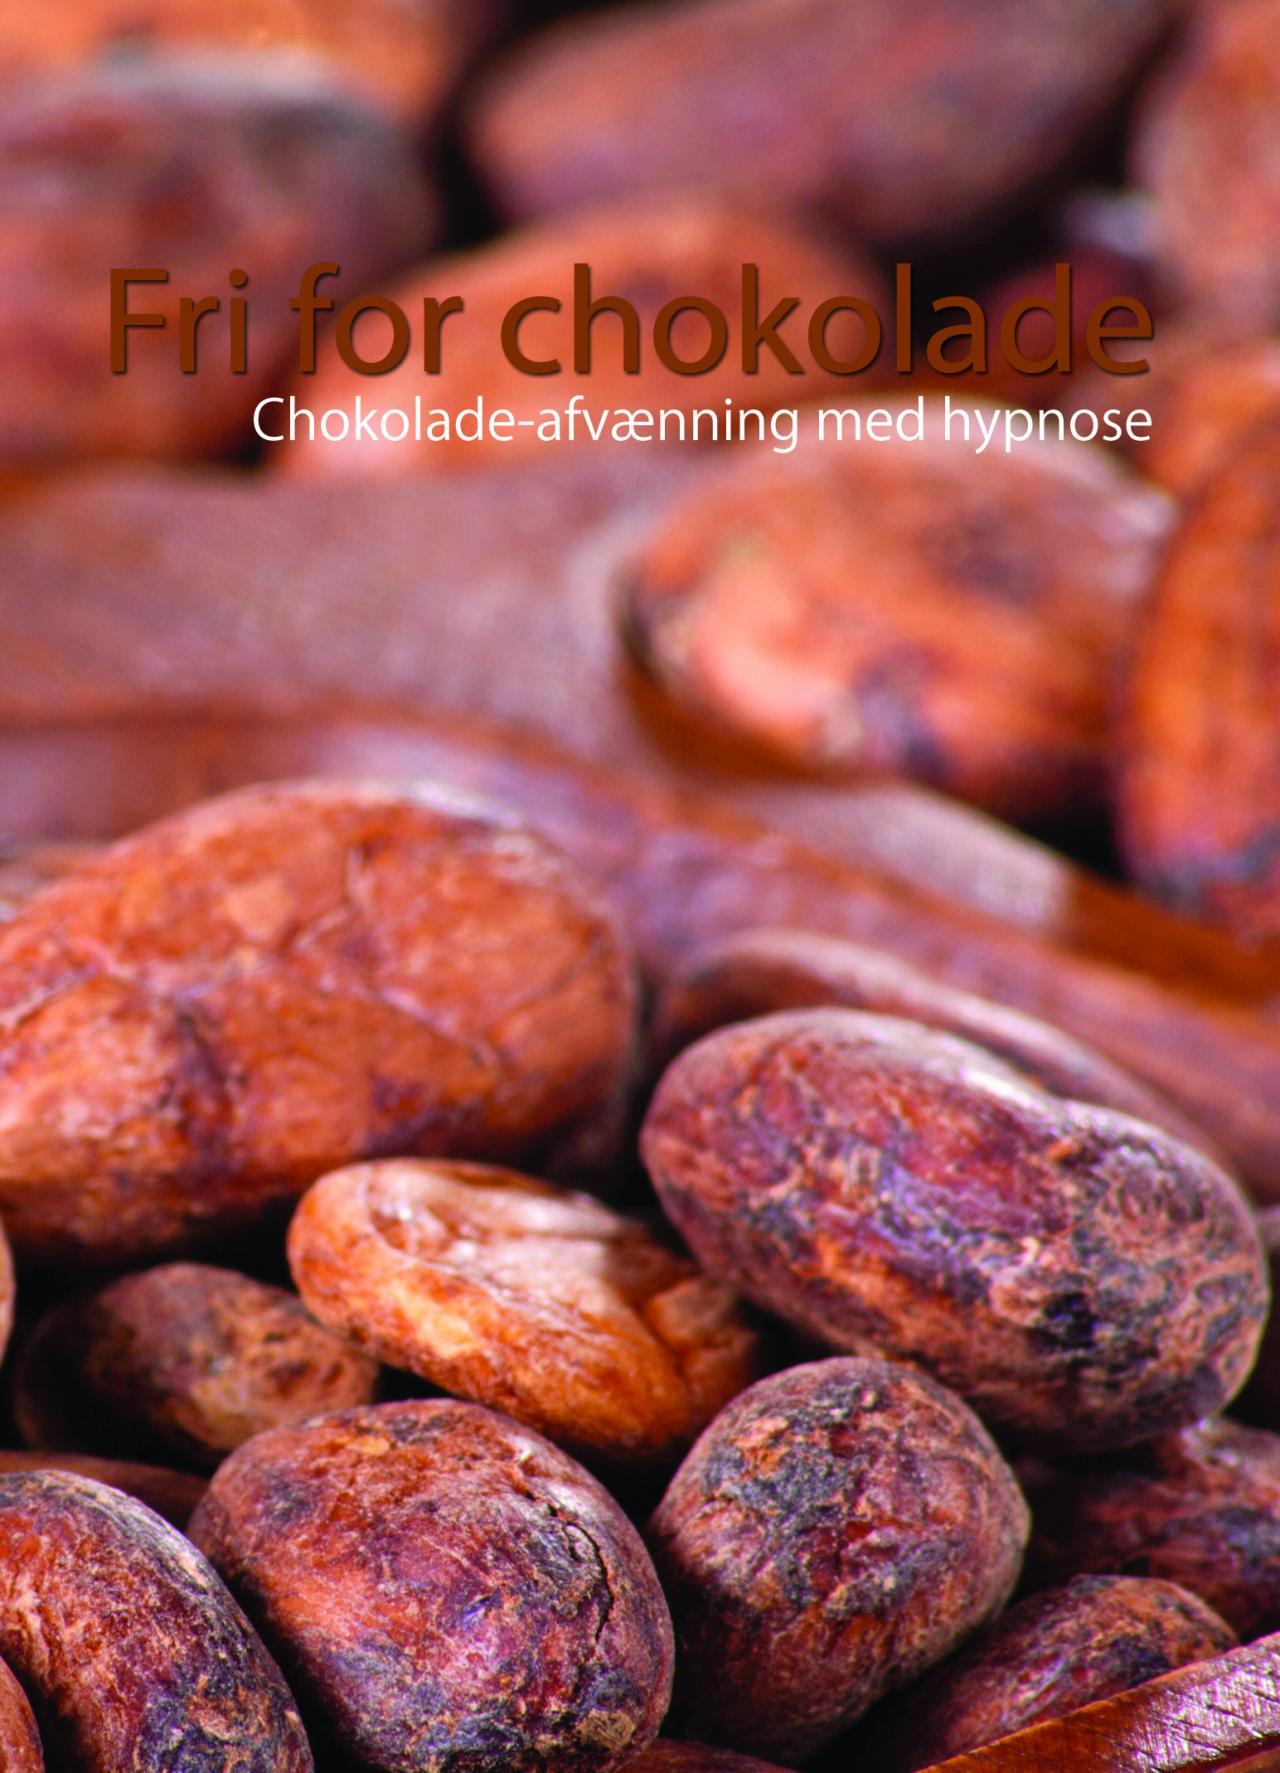 Image of Fri for chokolade - Chokolade-afvænning med hypnose